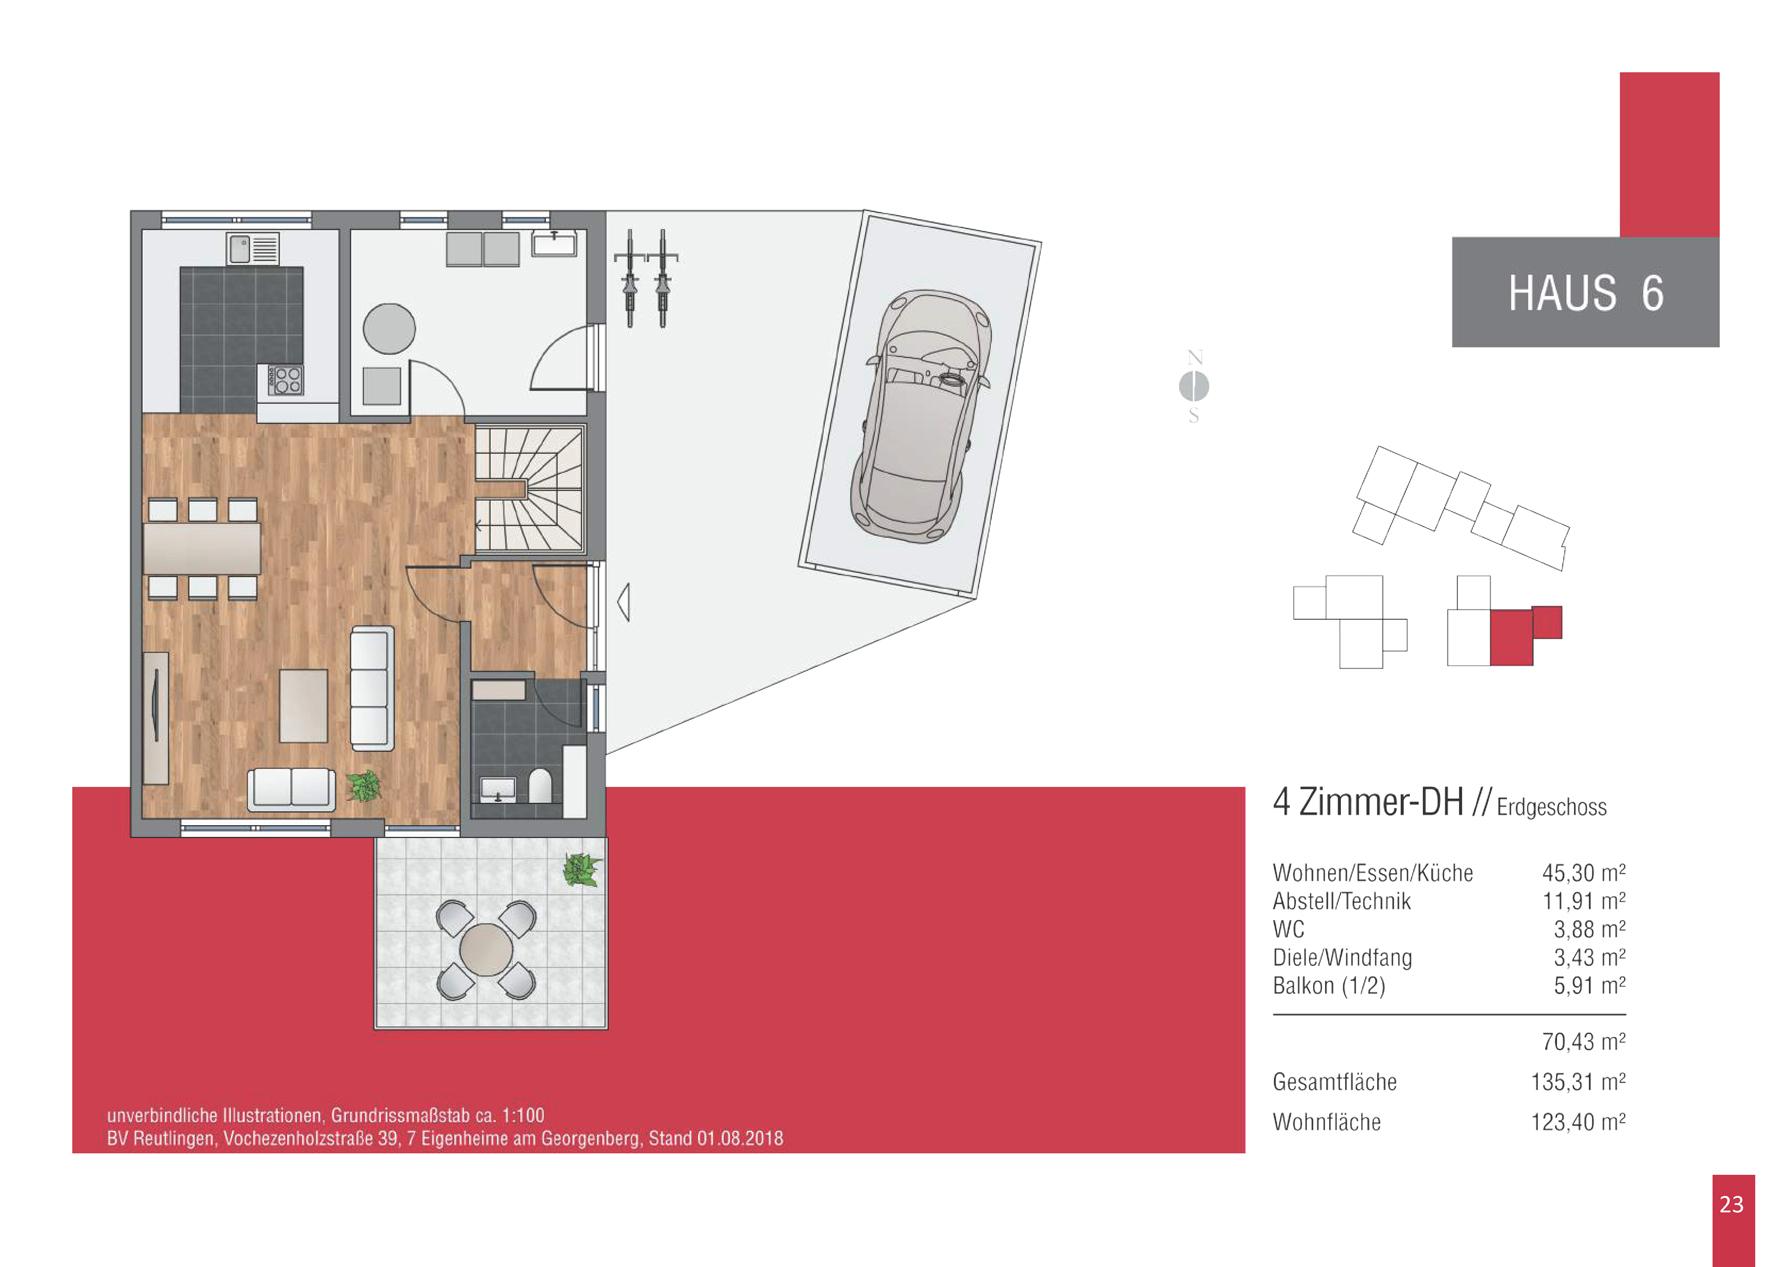 Bv Reutlingen Vochezenholzstrasse Grundriss Haus 6 Eg Englert